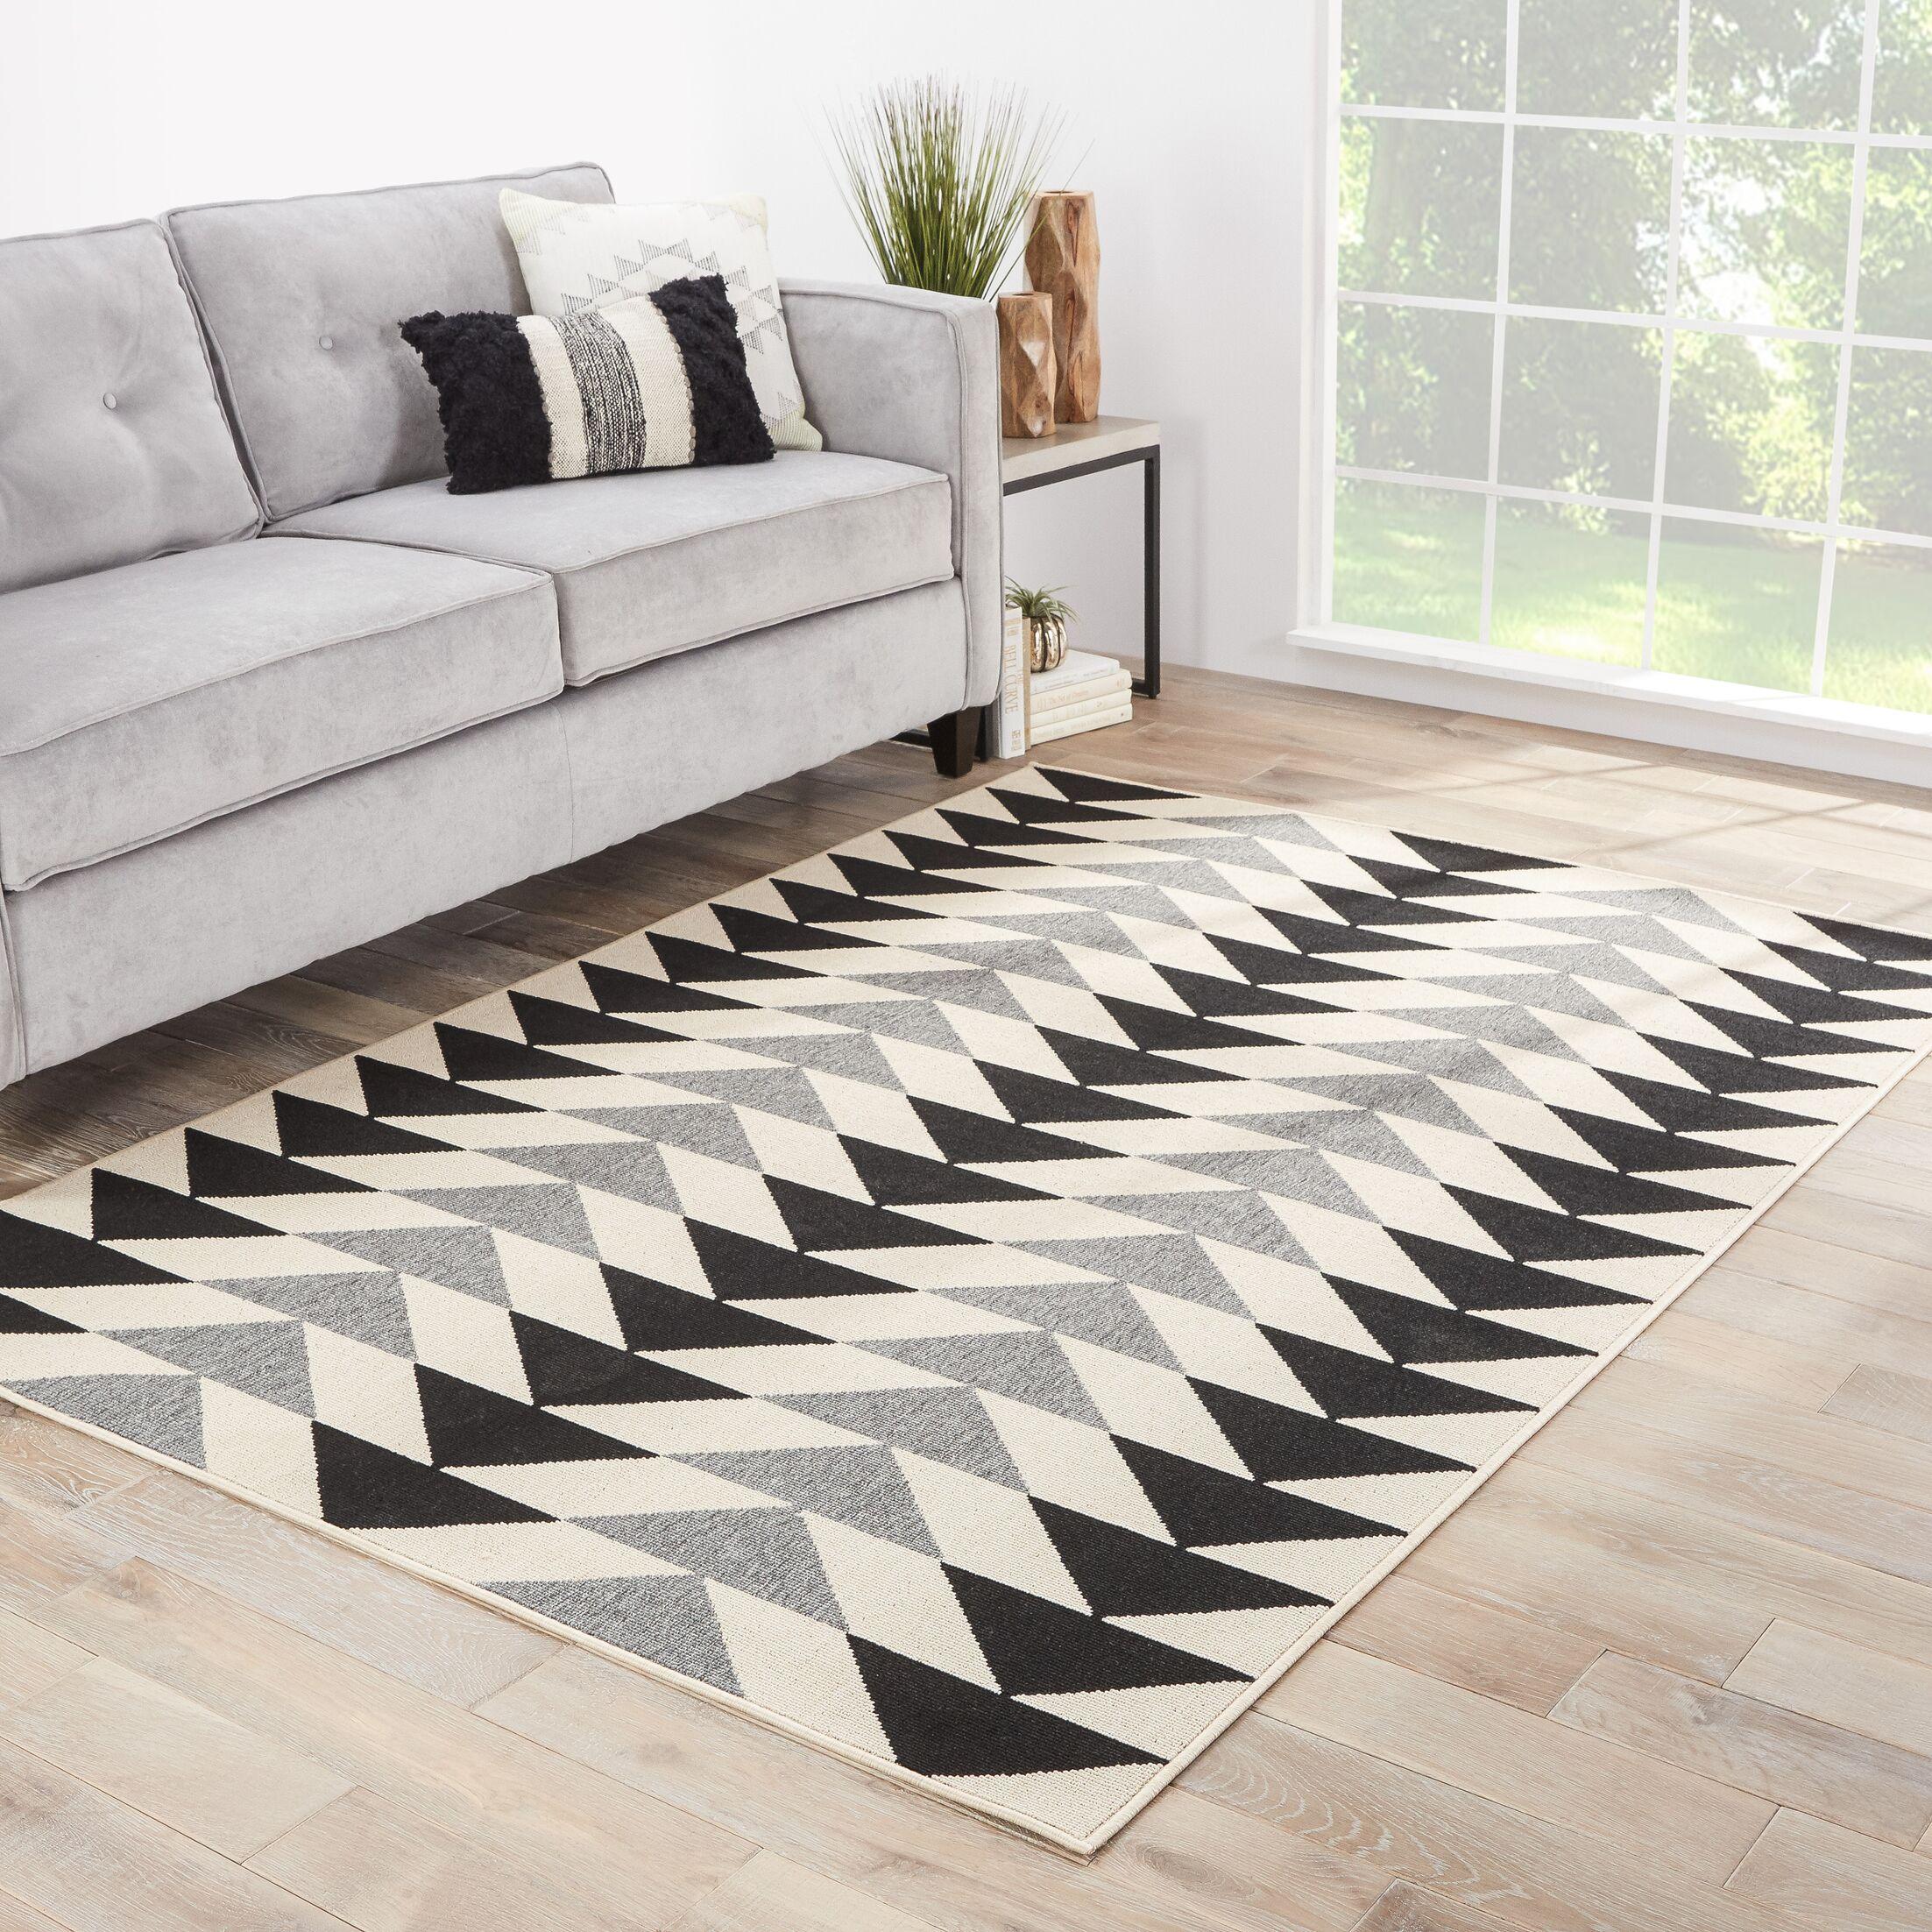 Hendrick Ivory/Black Indoor/Outdoor Area Rug Rug Size: Rectangle 2'6